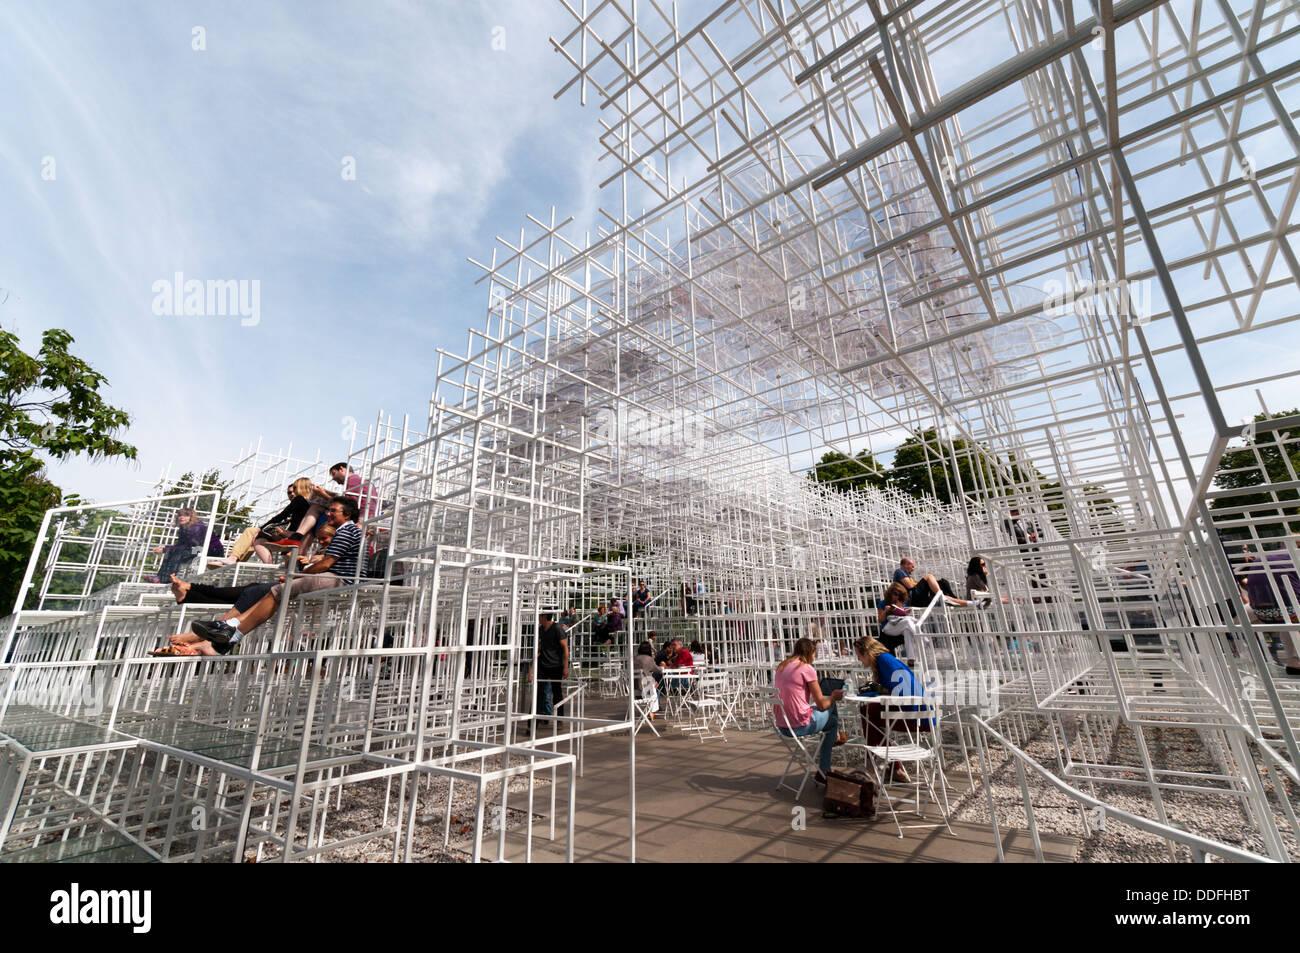 Visitors enjoying the 2013 Serpentine Gallery Summer Pavilion designed by the Japanese architect Sou Fujimoto. - Stock Image